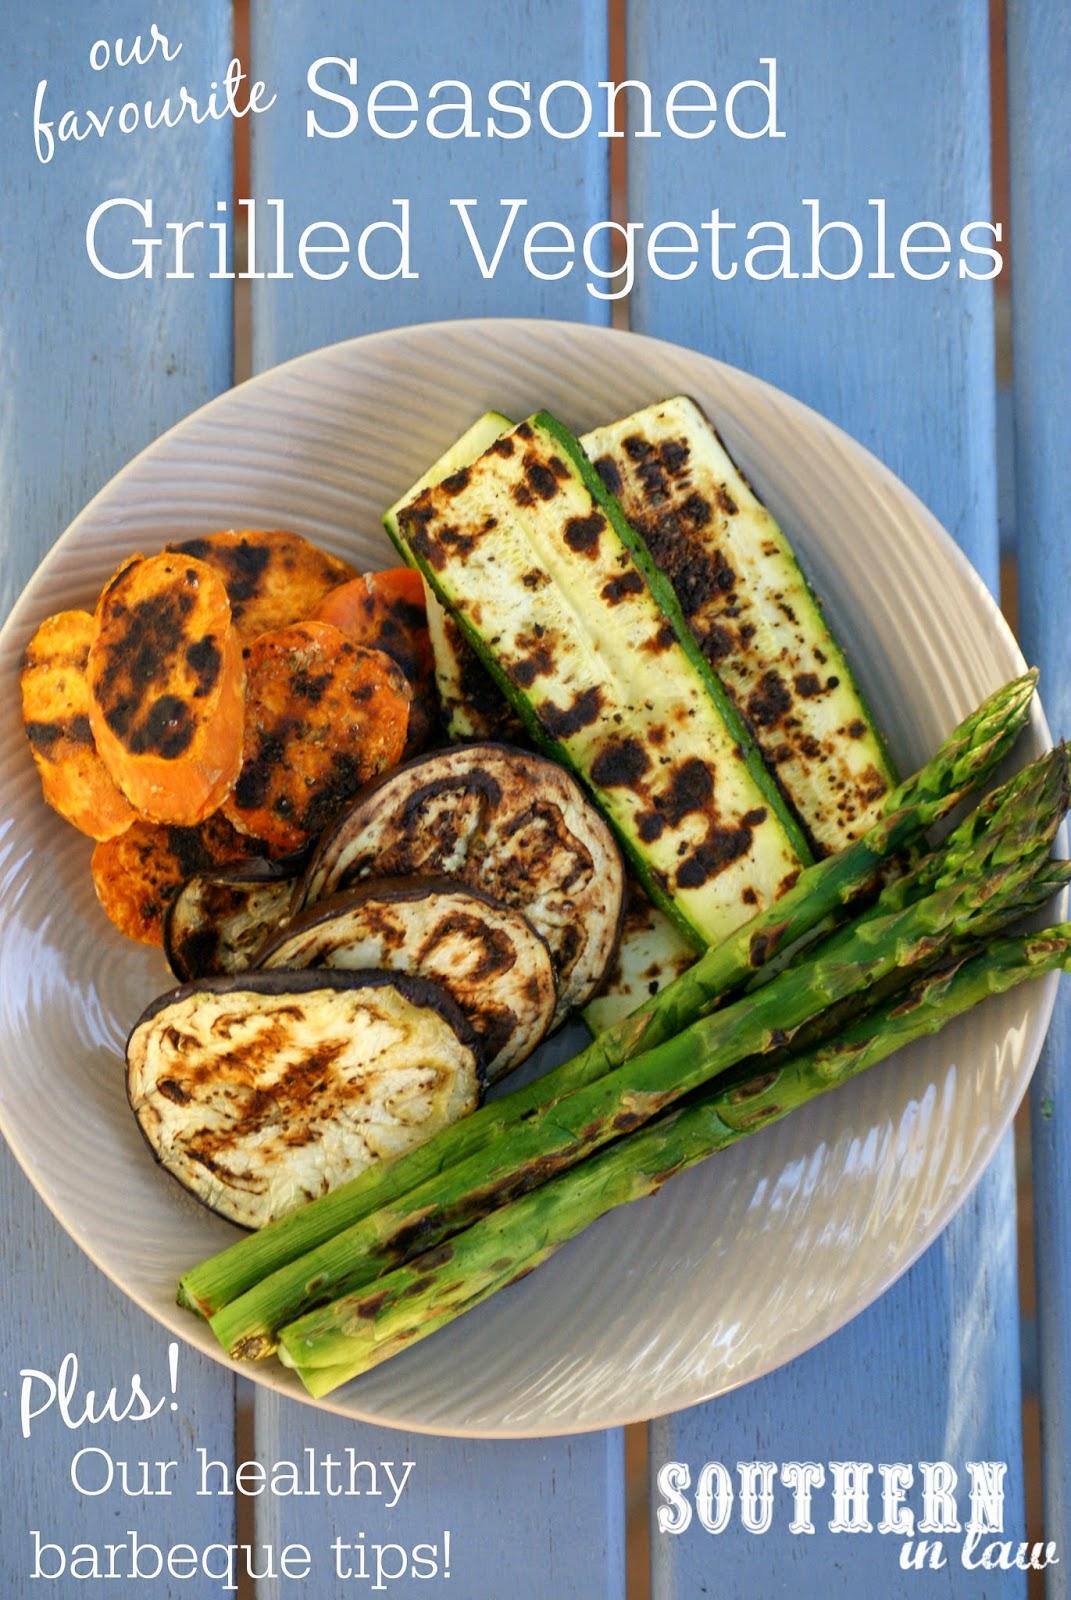 Healthy Grilling Tips - Healthy Seasoned Grilled Vegetables Recipe - low fat, vegan, gluten free, vegetarian, sugar free